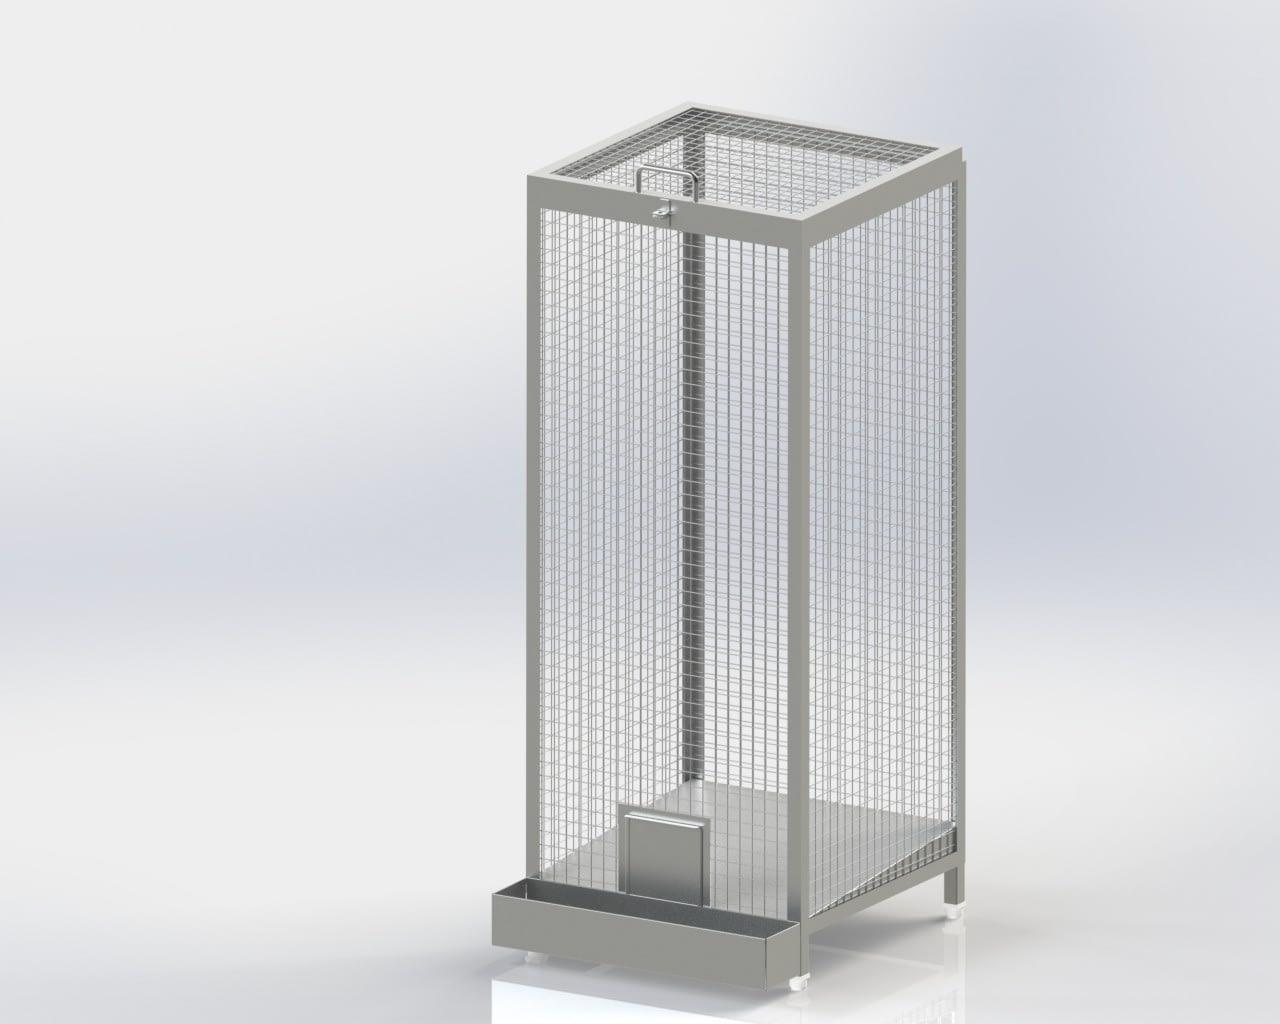 Single Chamber Wire Mesh Storage Bin Fi-Fo Type